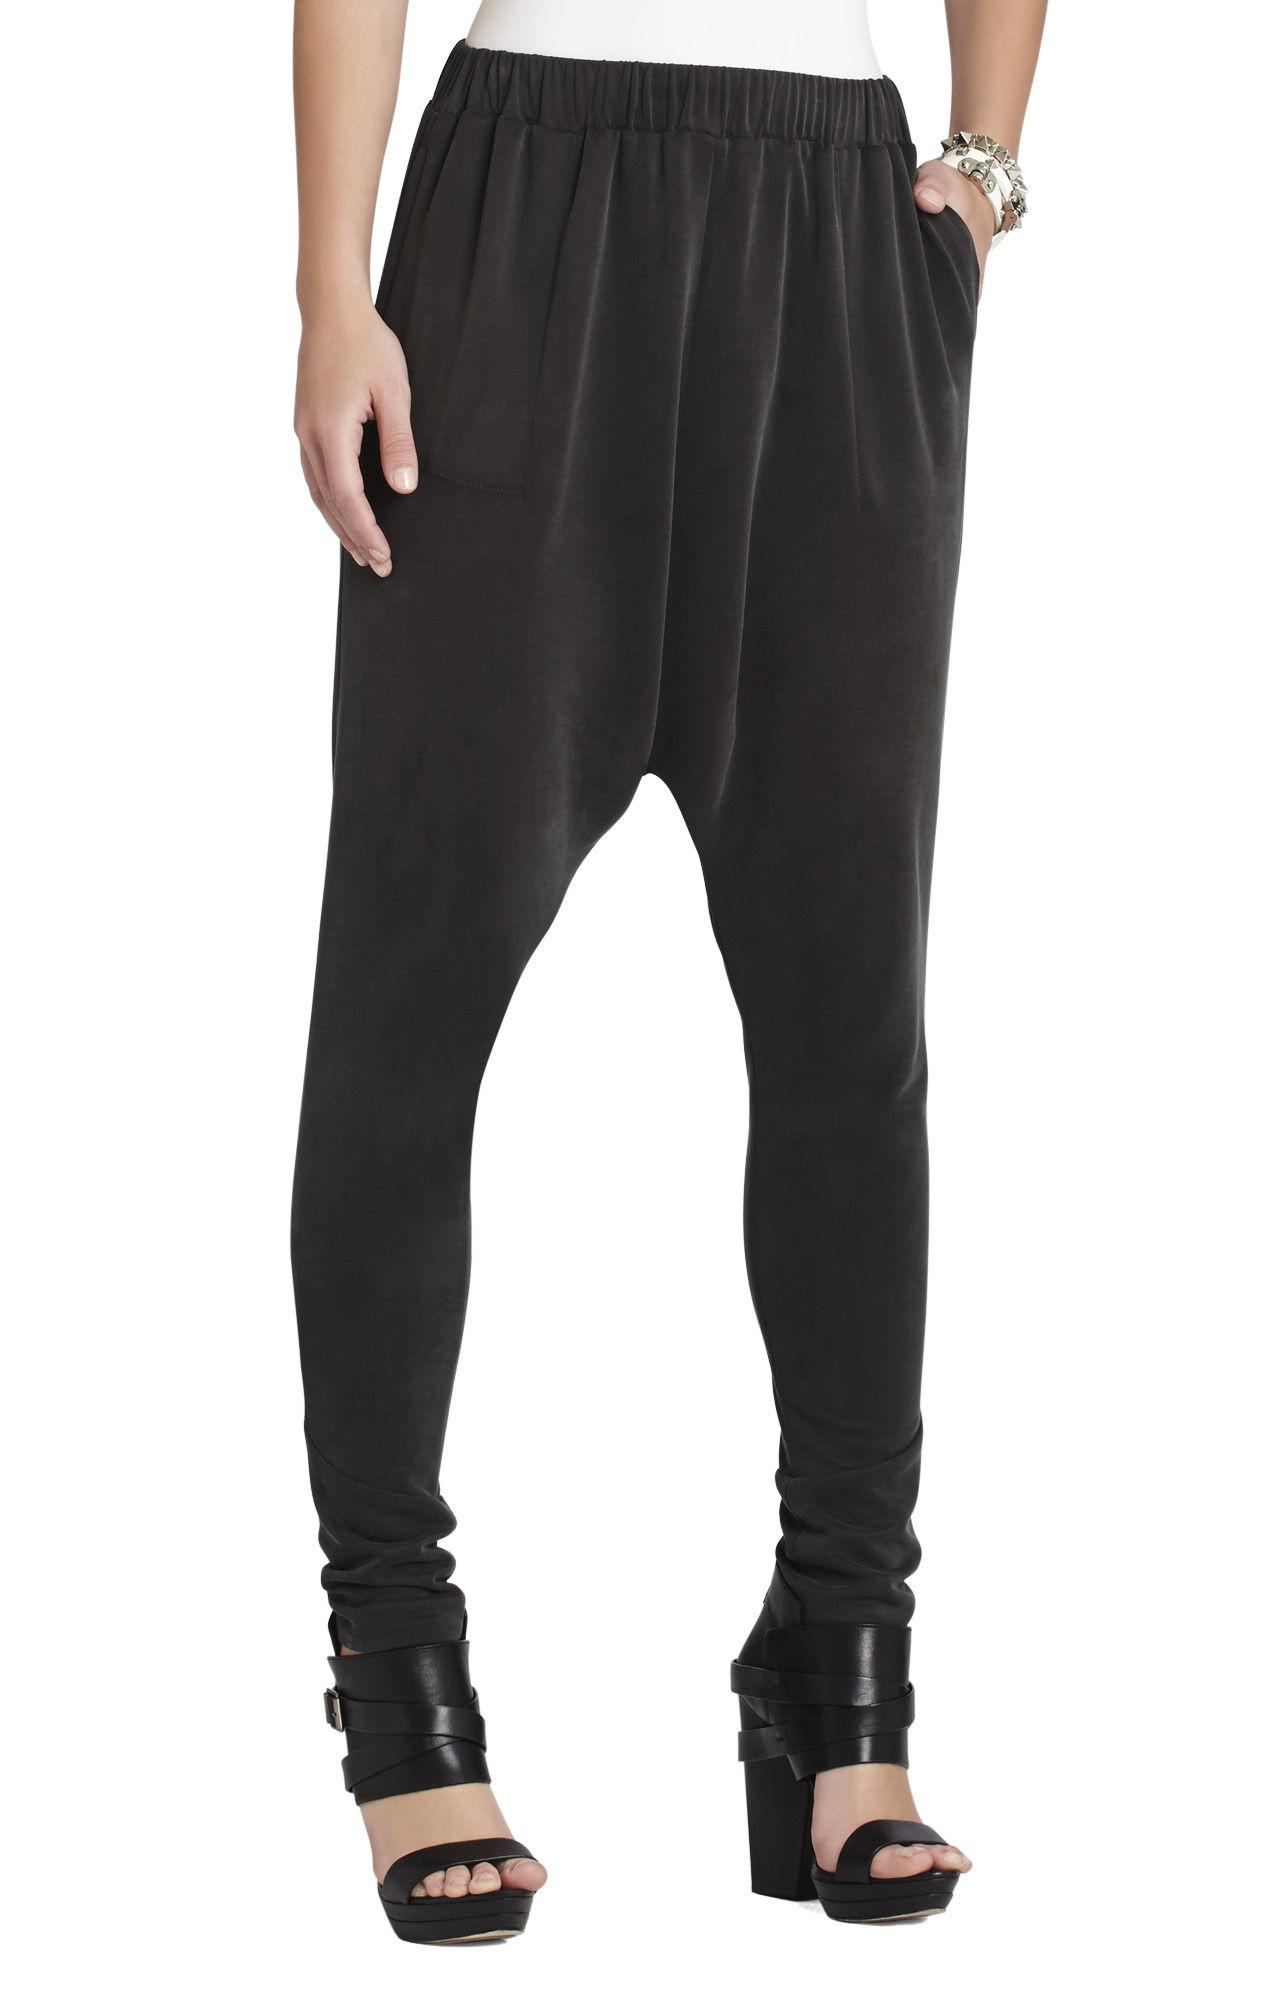 Bcbgmaxazria Kendell Harem Pant In Black Vintage Black